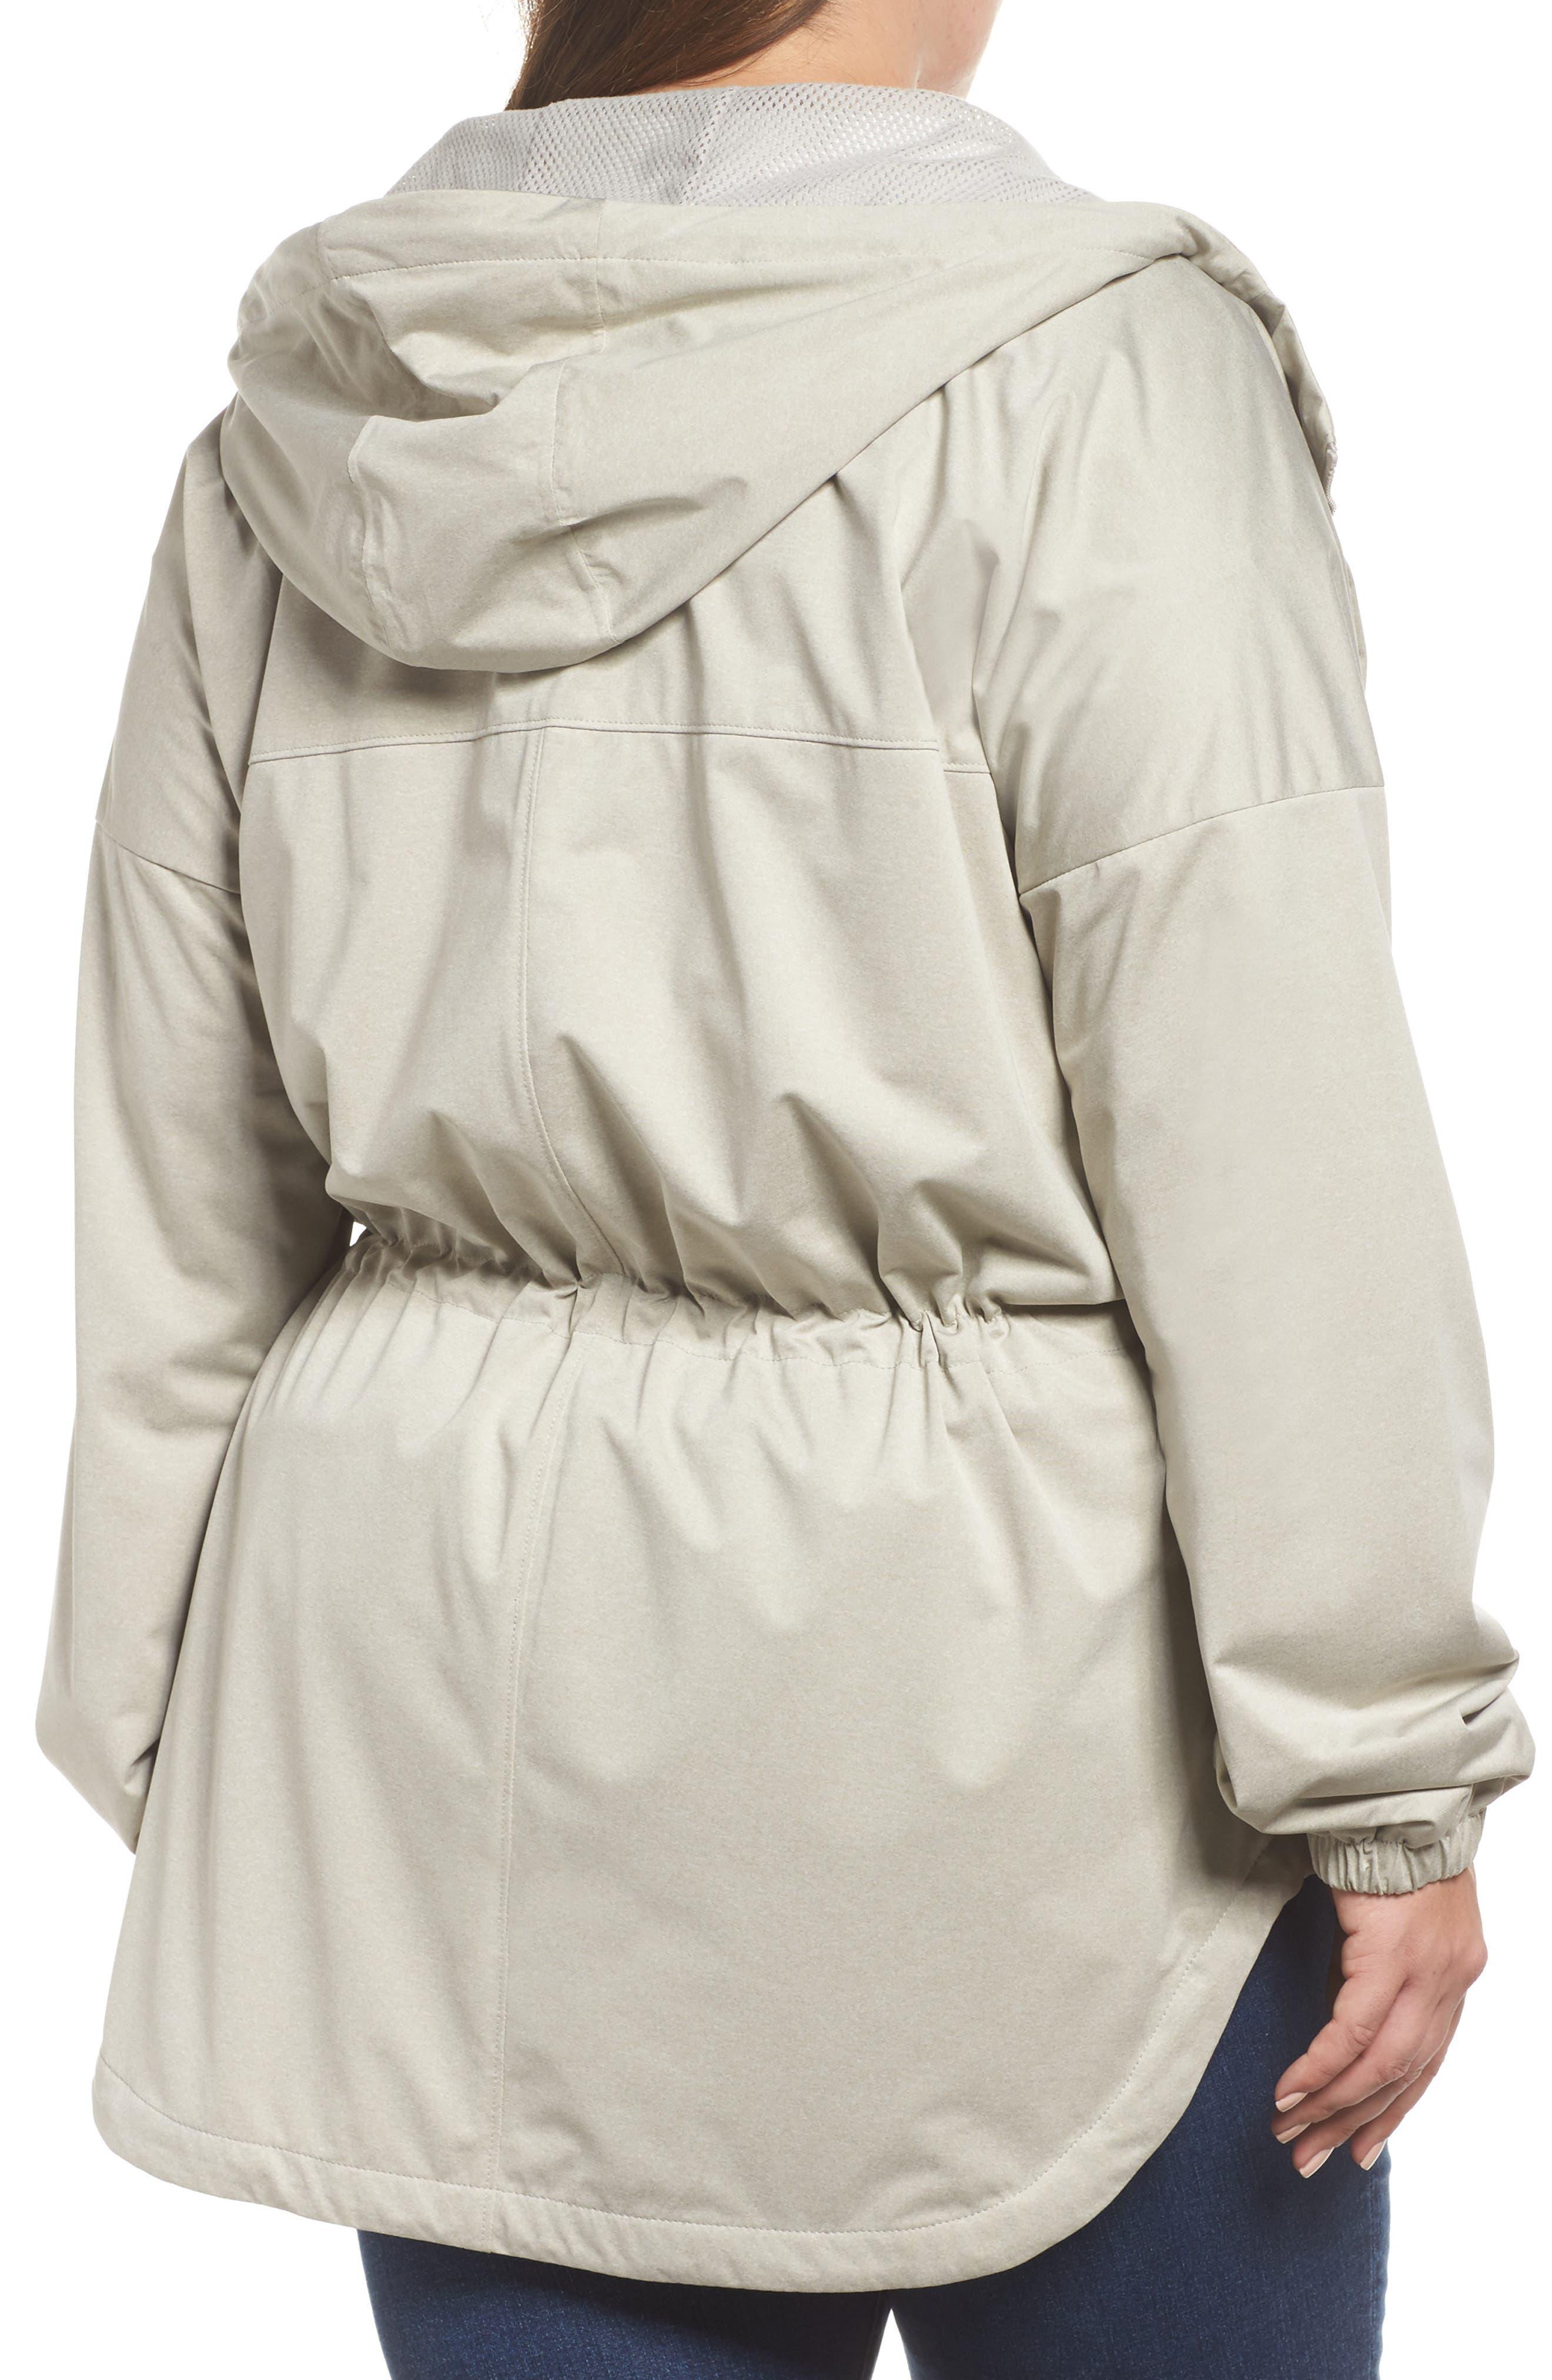 Northbounder Waterproof Hooded Jacket,                             Alternate thumbnail 2, color,